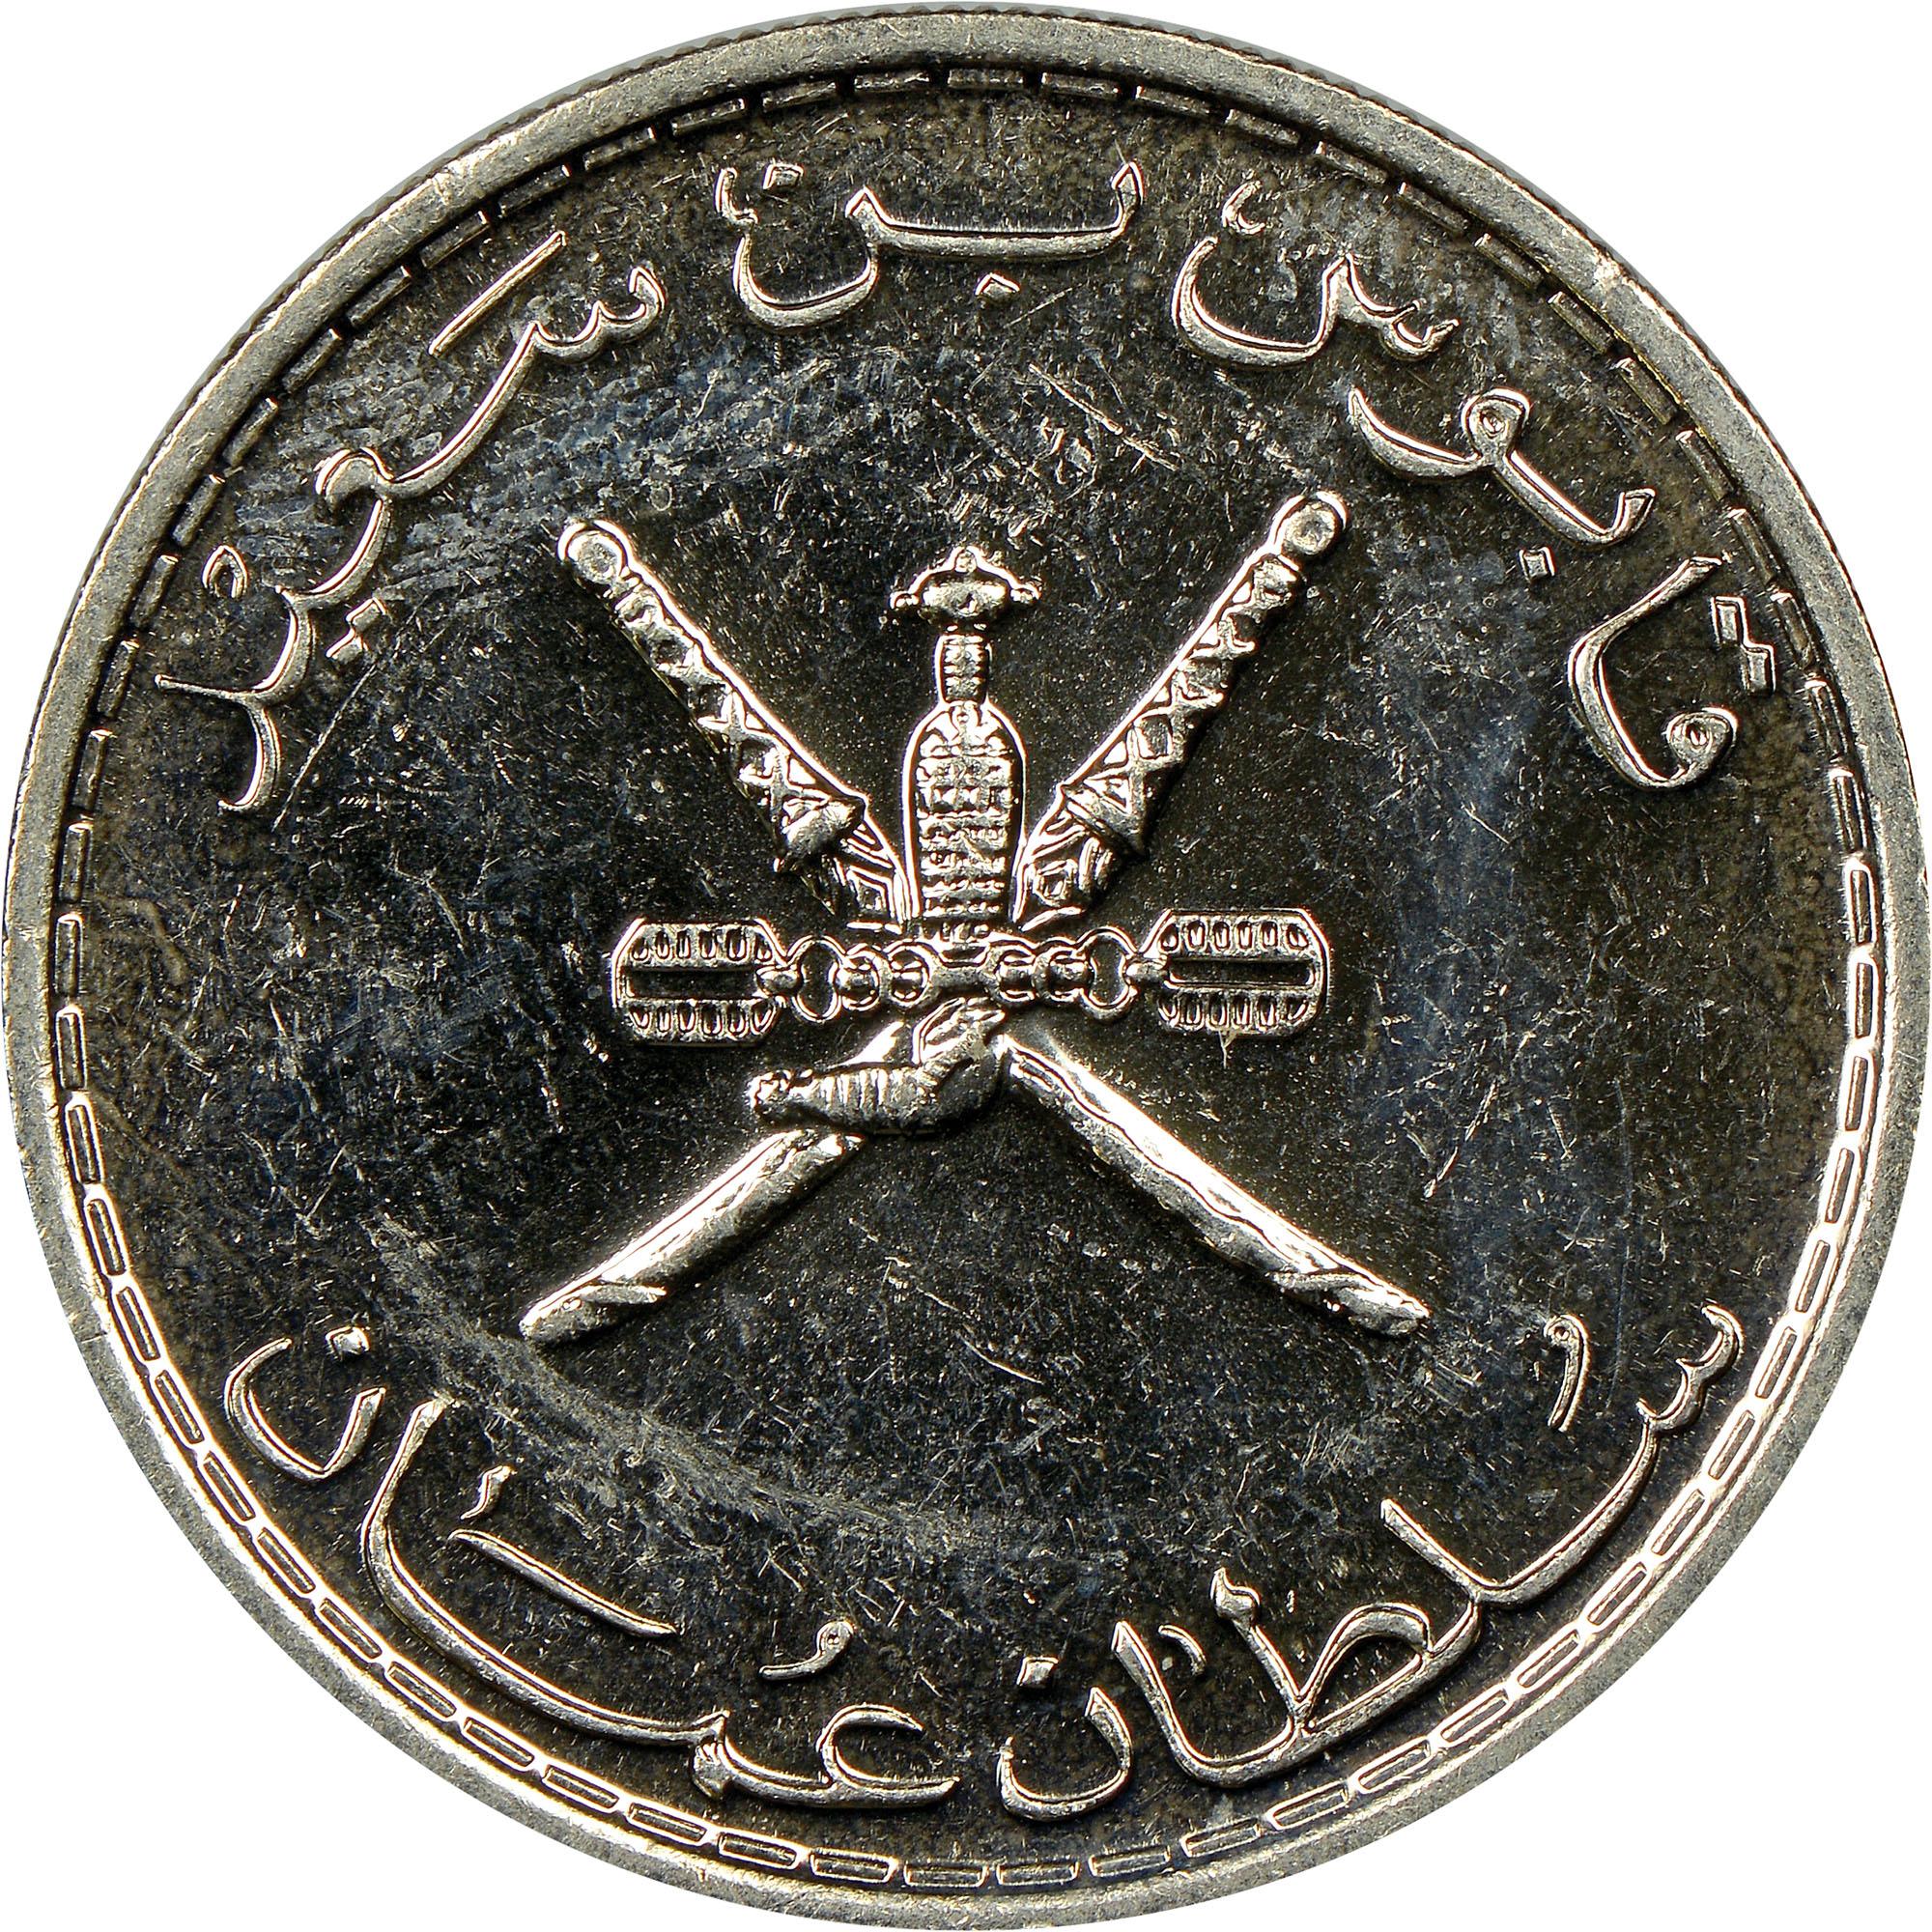 Oman 50 Baisa obverse